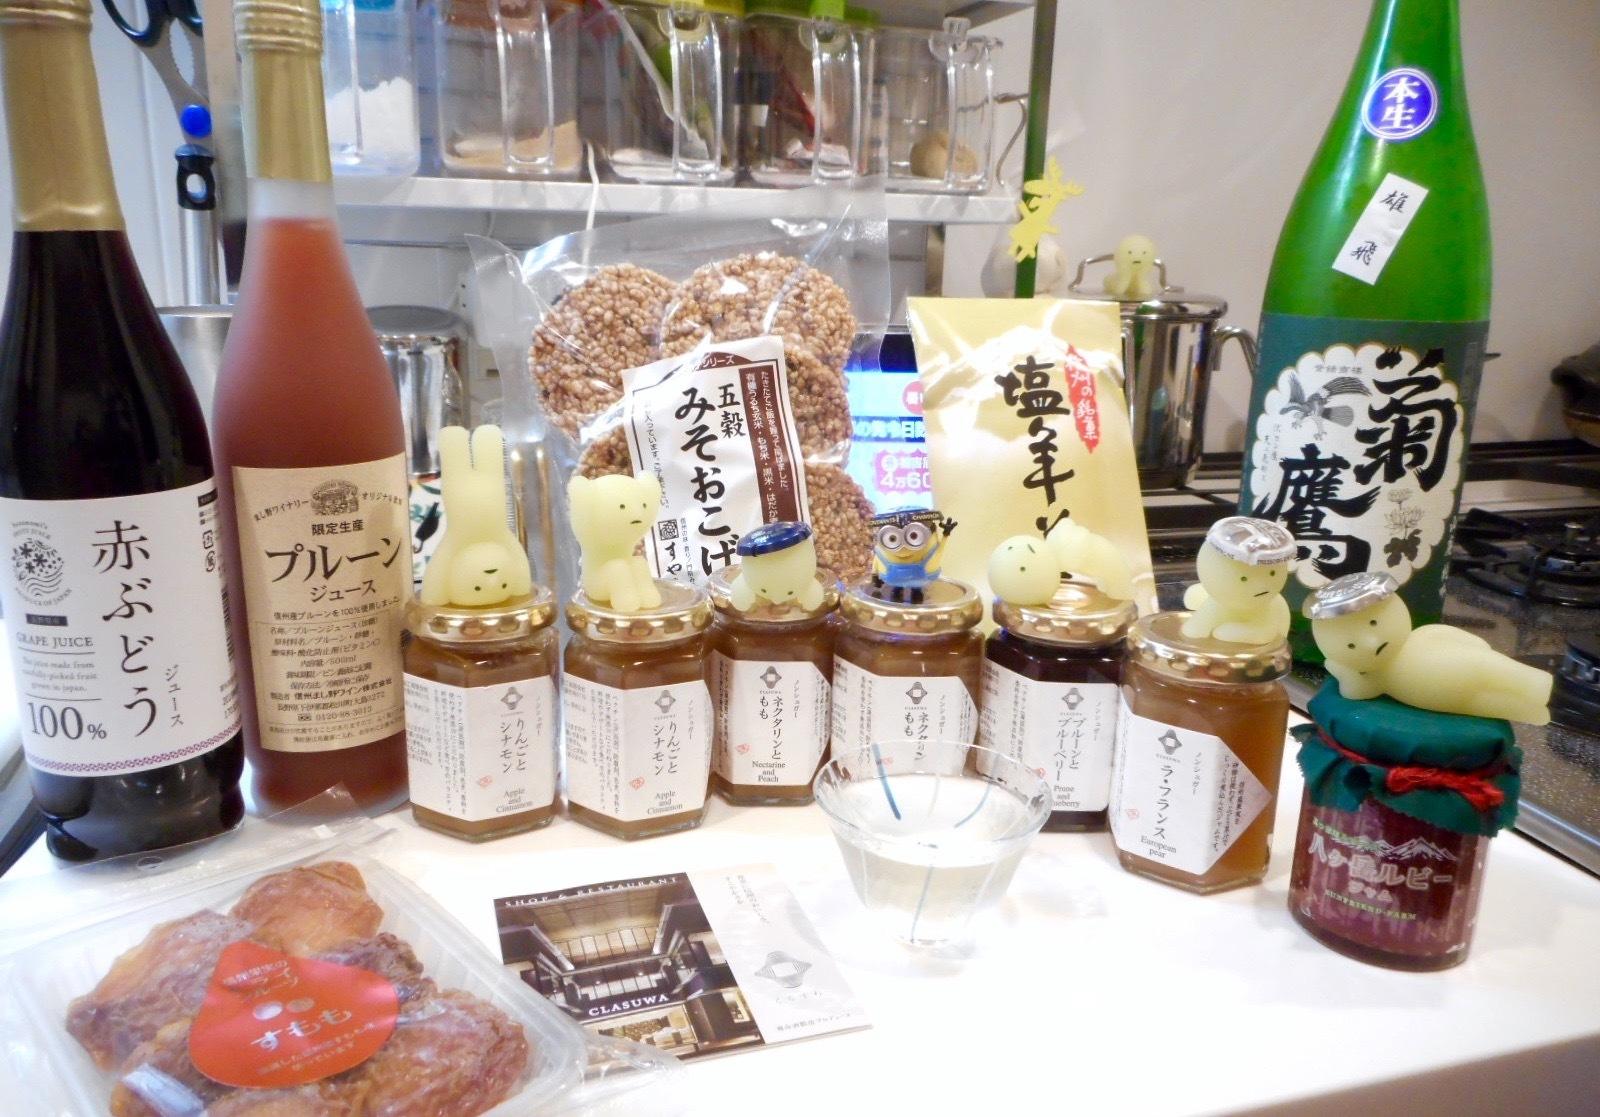 kikutaka_yuuhi_2nen_jukusei6.jpg